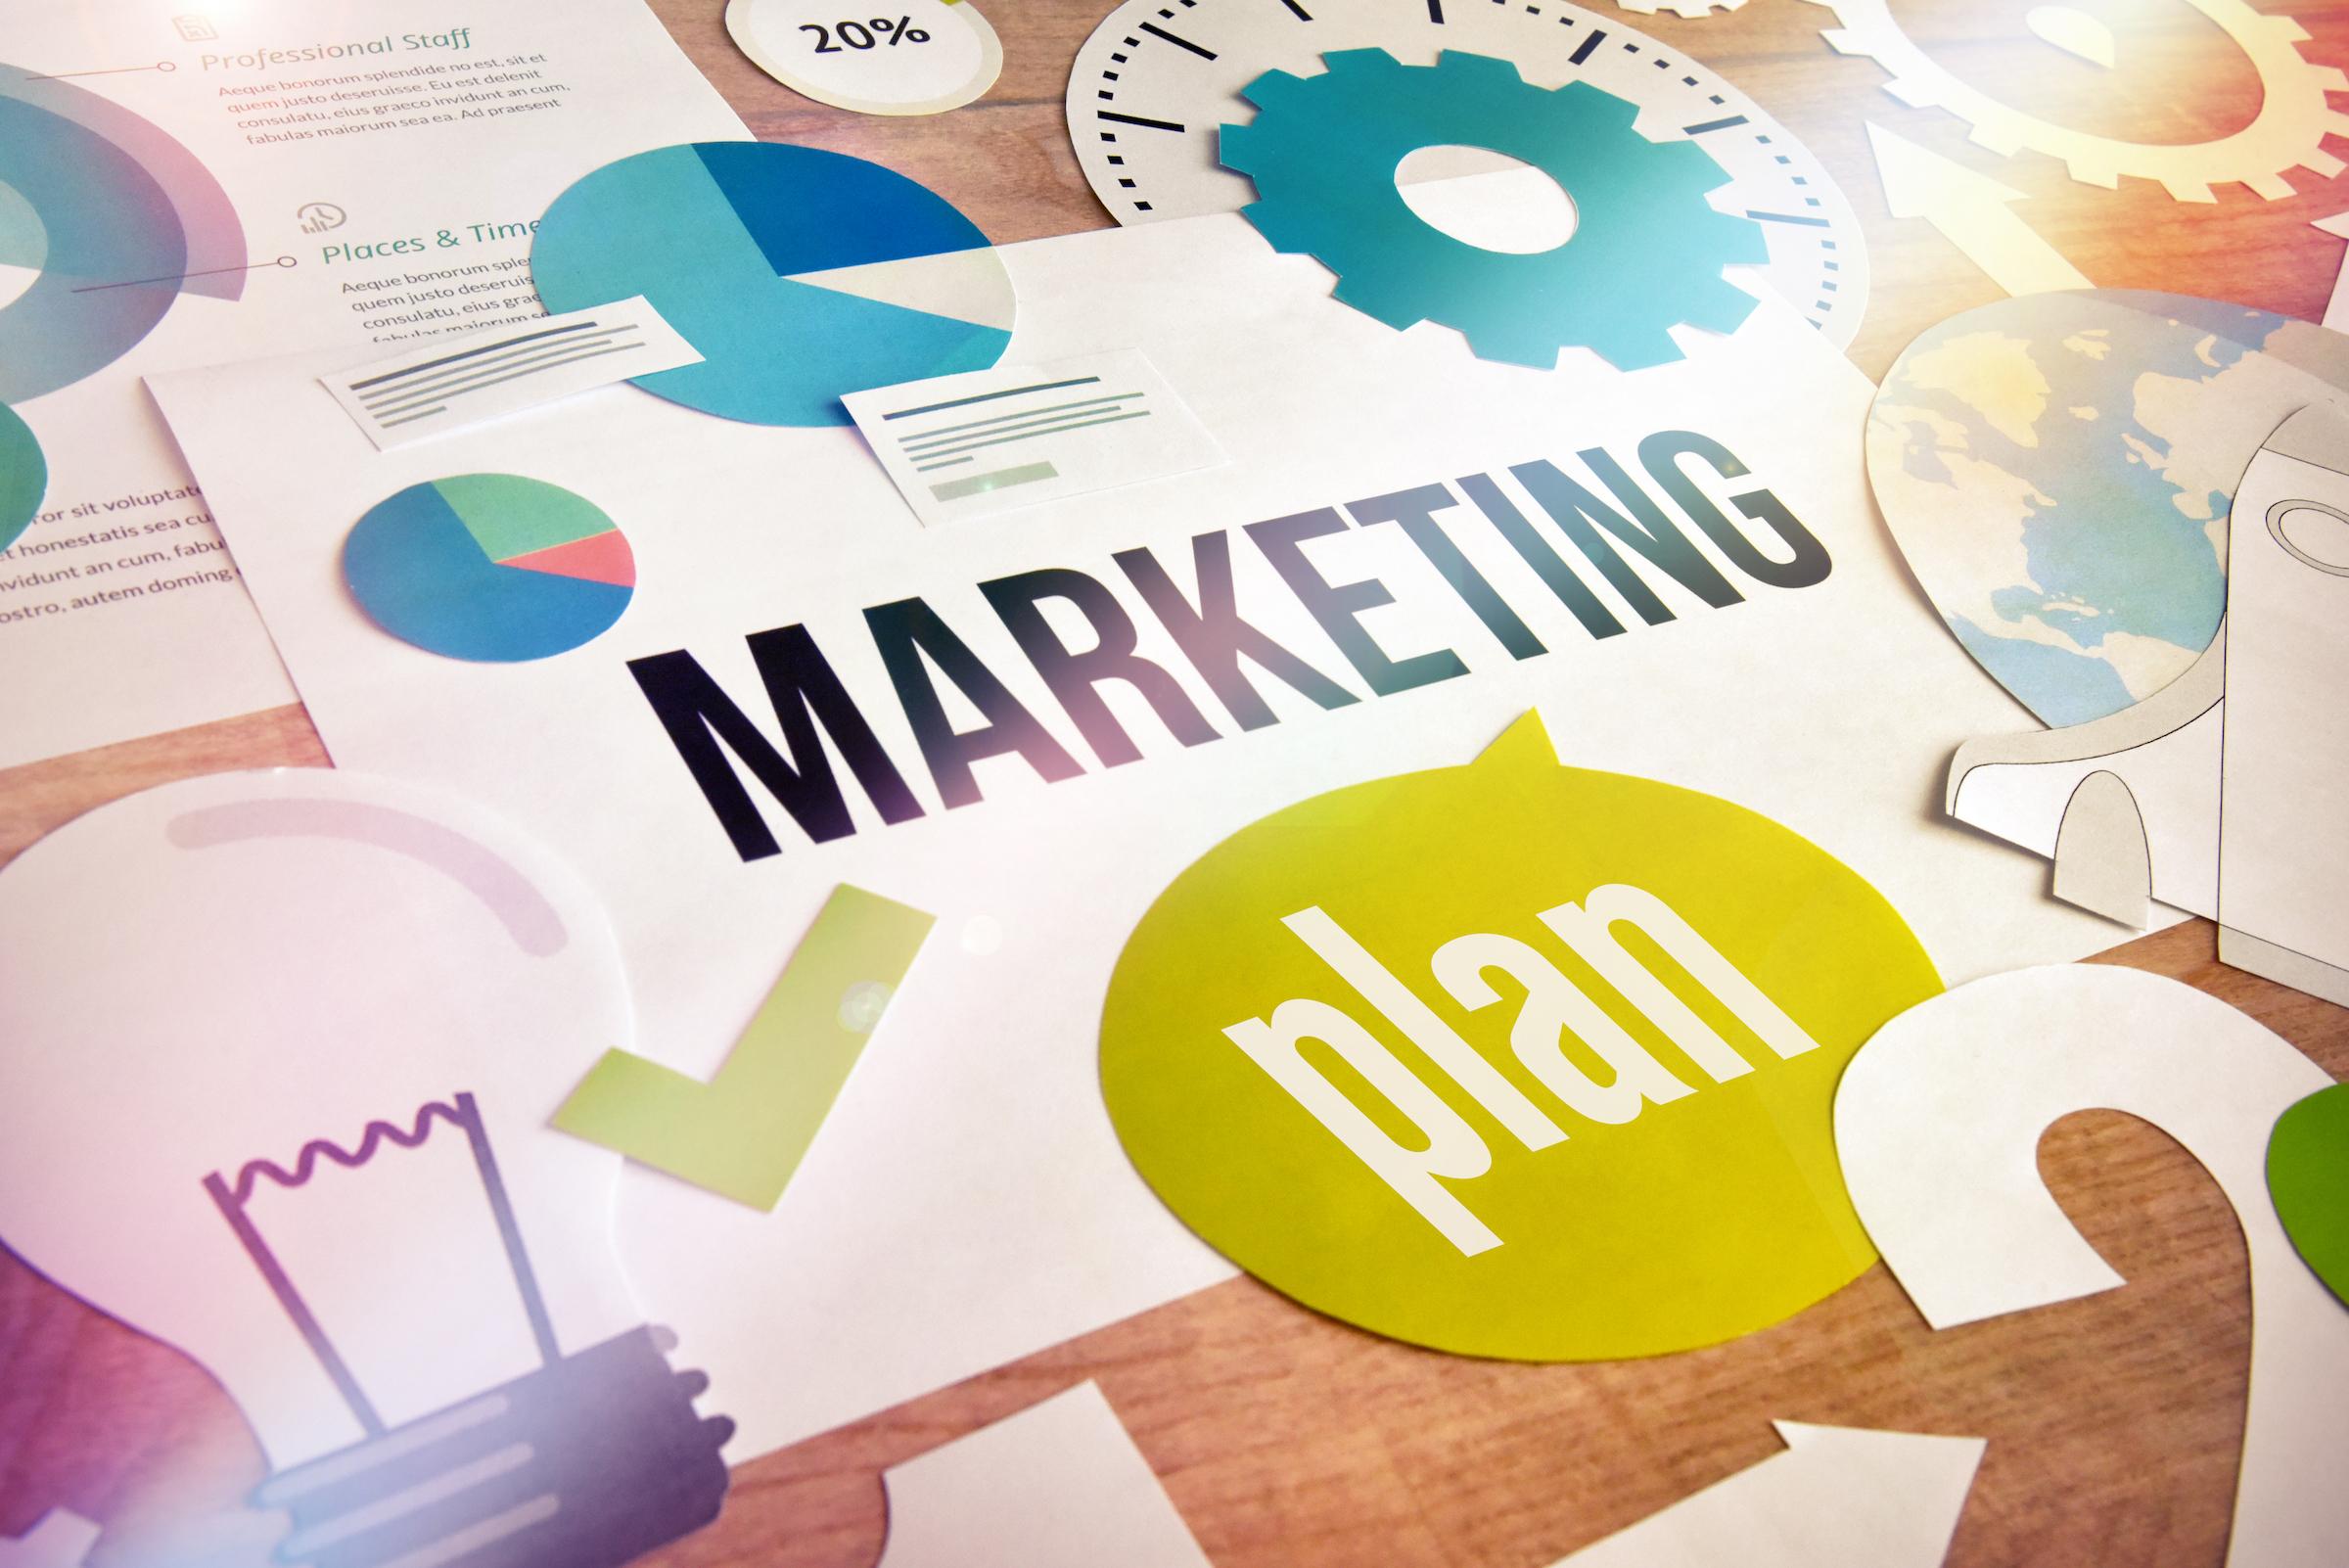 marketing-plan-P8R52RX.jpg